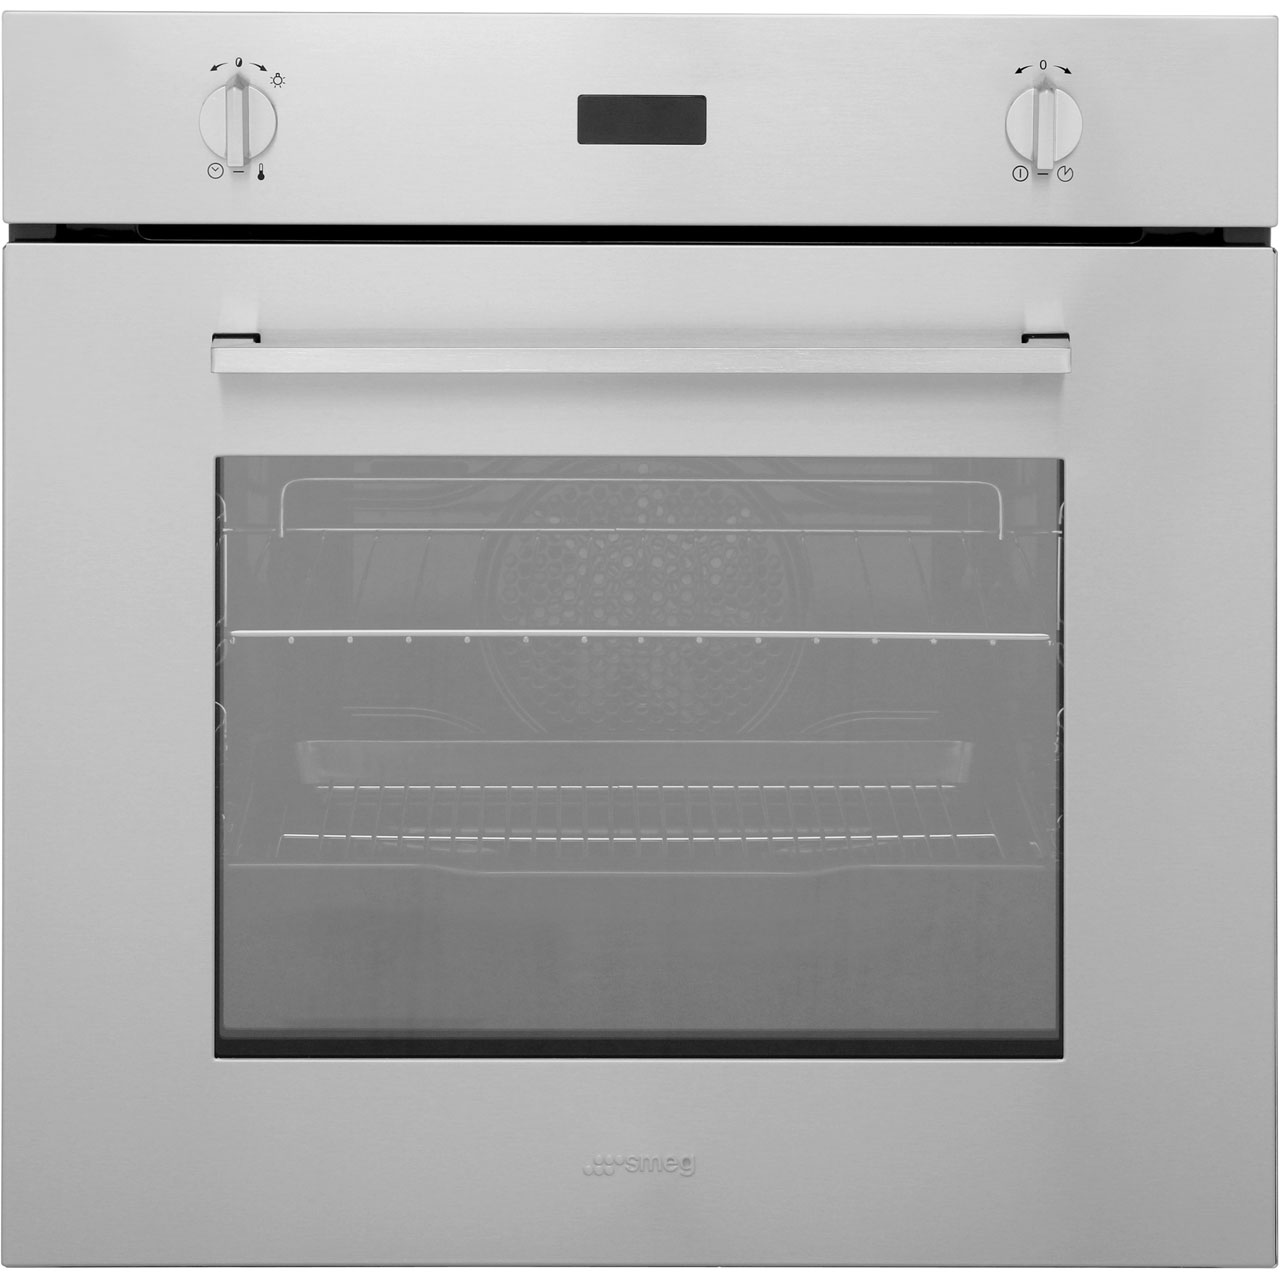 sf485x ss smeg built in electric single oven ao com rh ao com Cream Smeg Oven Smeg Oven Dial